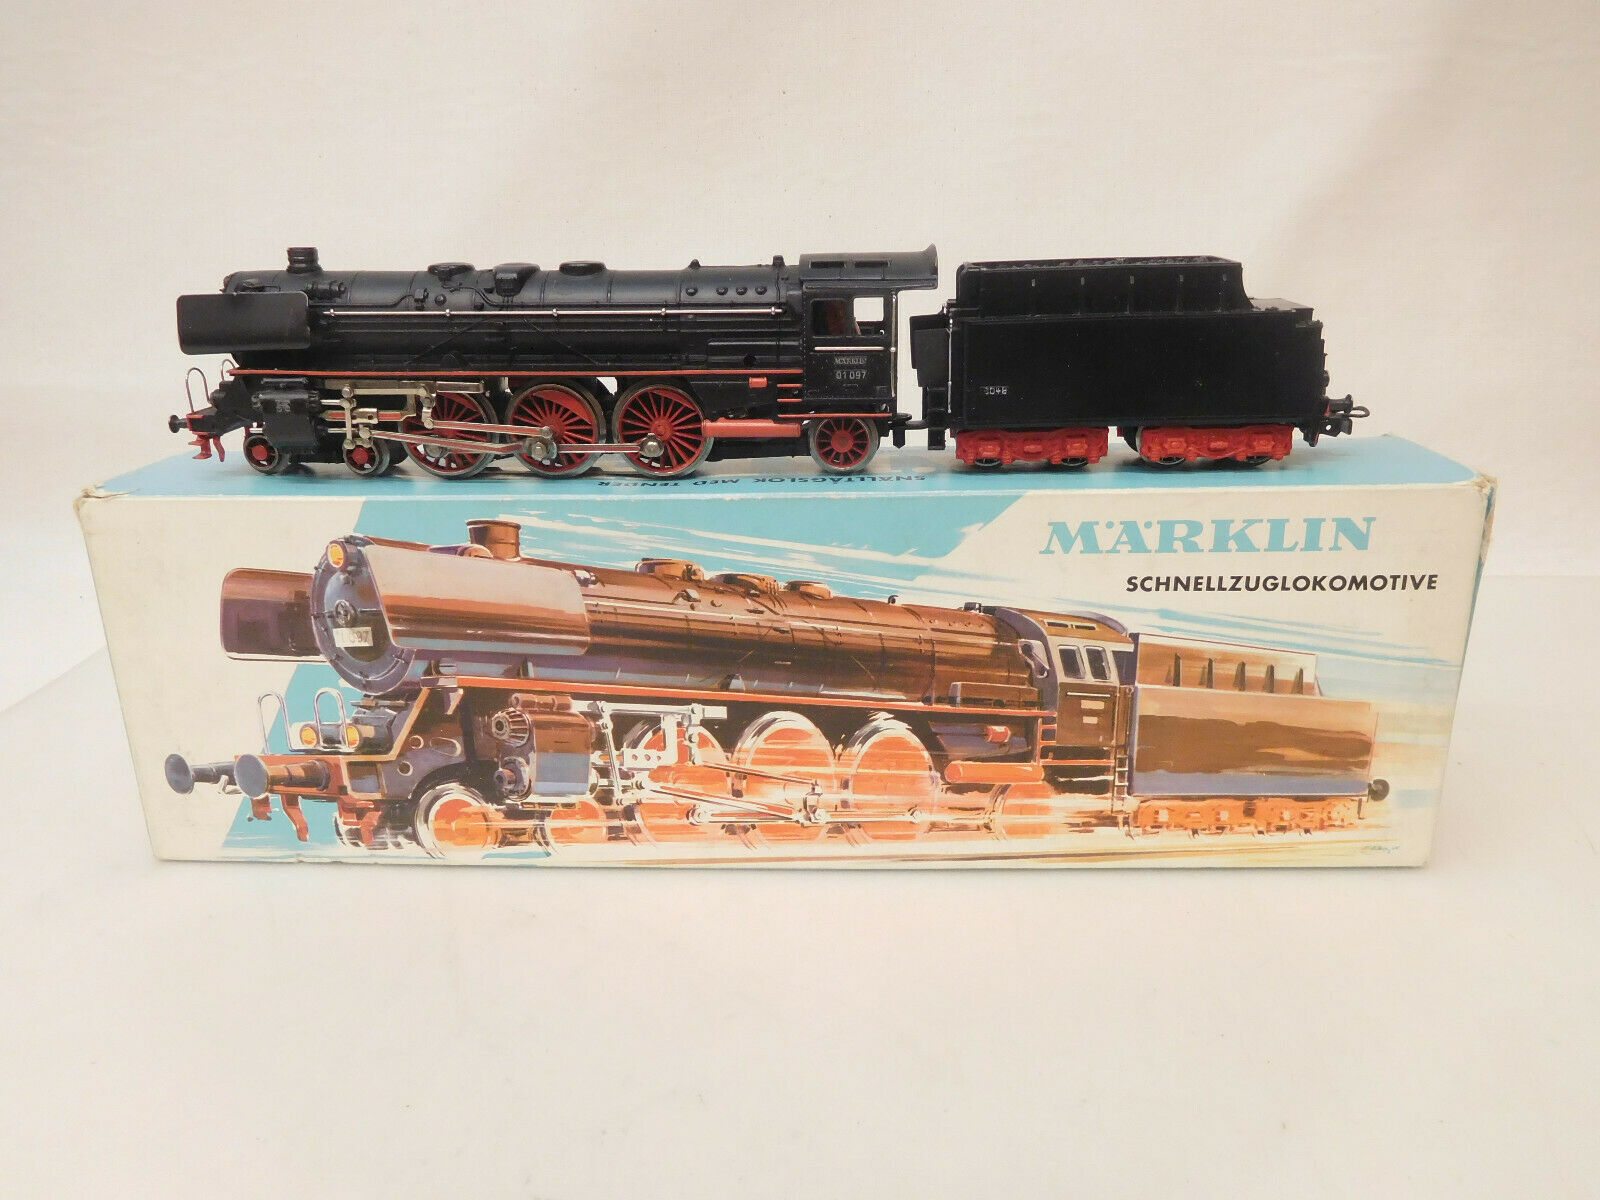 X-07902 Märklin 3048 H0 Steam Locomotive 01 097 with minimal wear